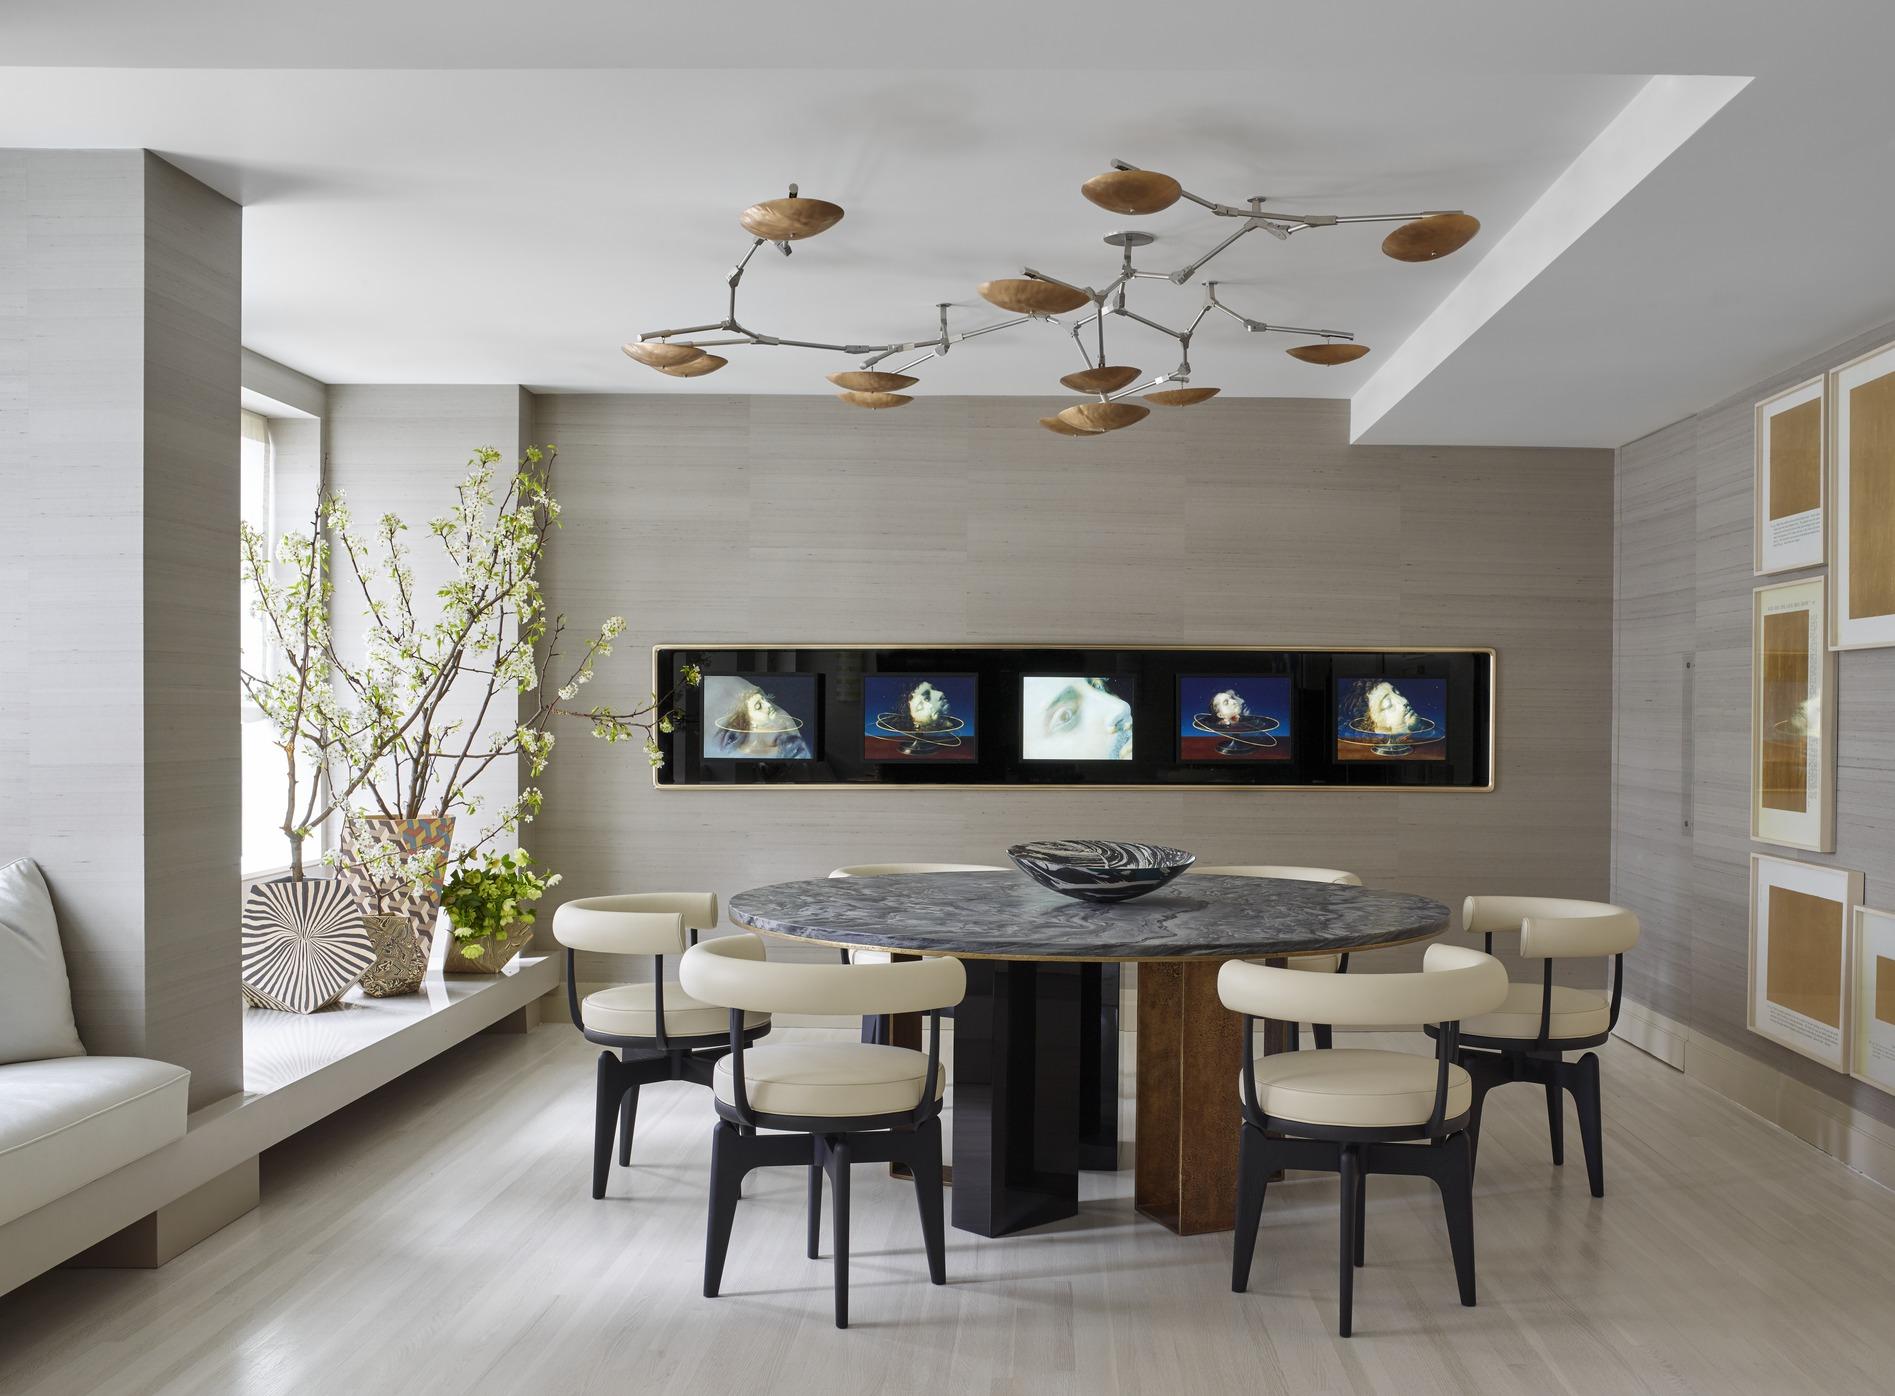 25 modern dining room decorating ideas - contemporary dining room furniture JBGWQIV